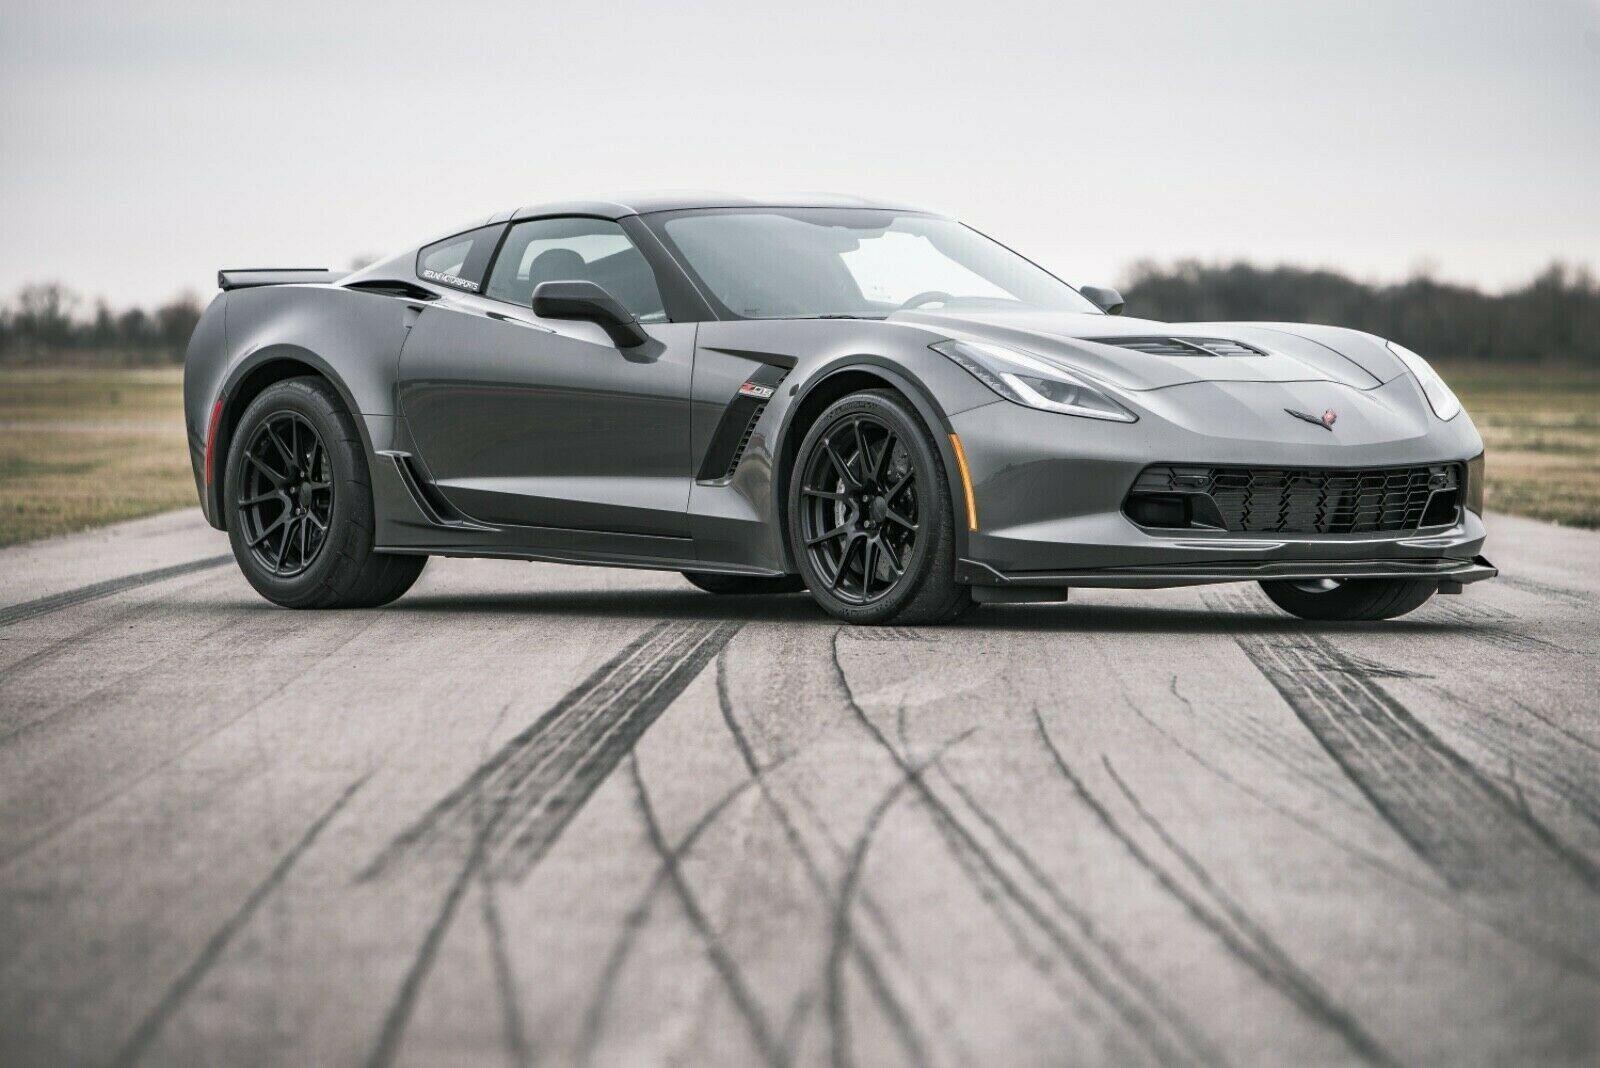 2016 Grey Chevrolet Corvette   | C7 Corvette Photo 1